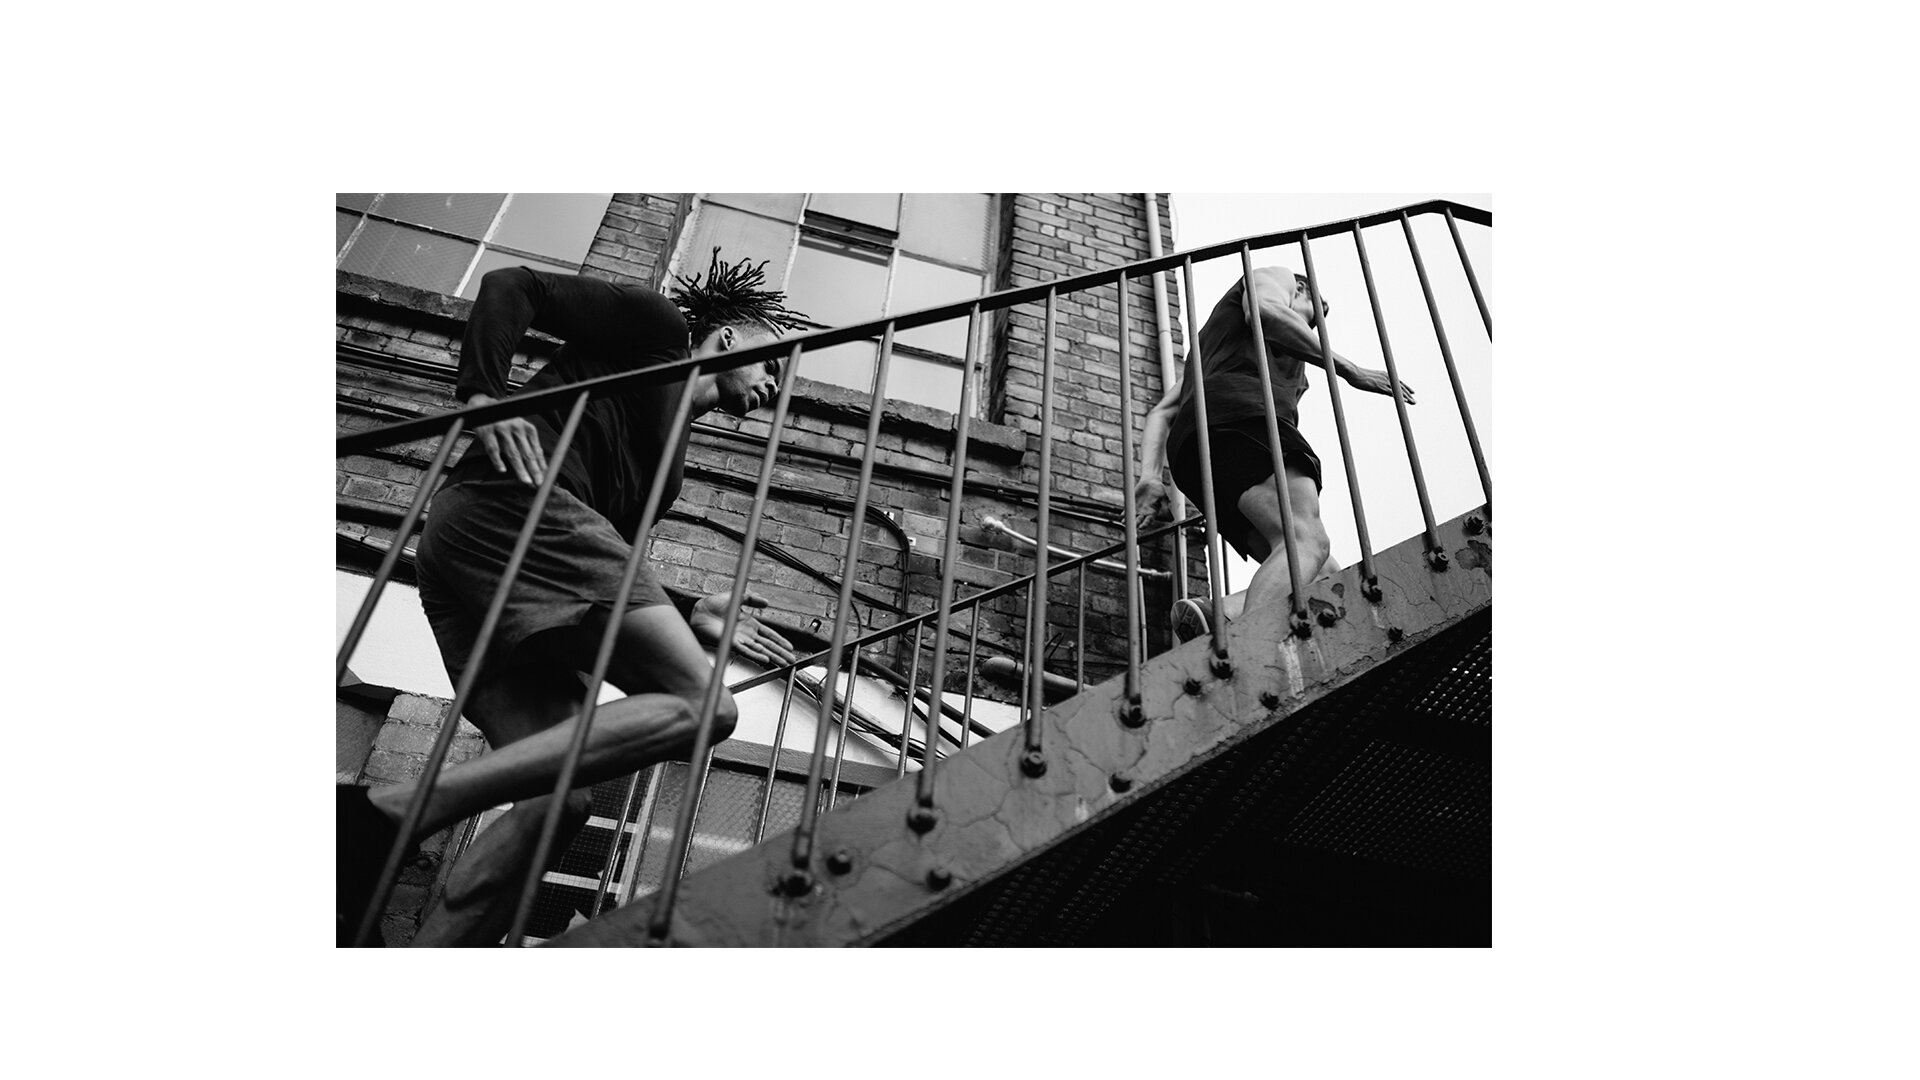 toby-butler-tobybutlerphoto-photography-fitness-lifestyle-lifestylephotographer-london-city-body-lululemon-yoga-stretch-emotion-physical-6.jpg